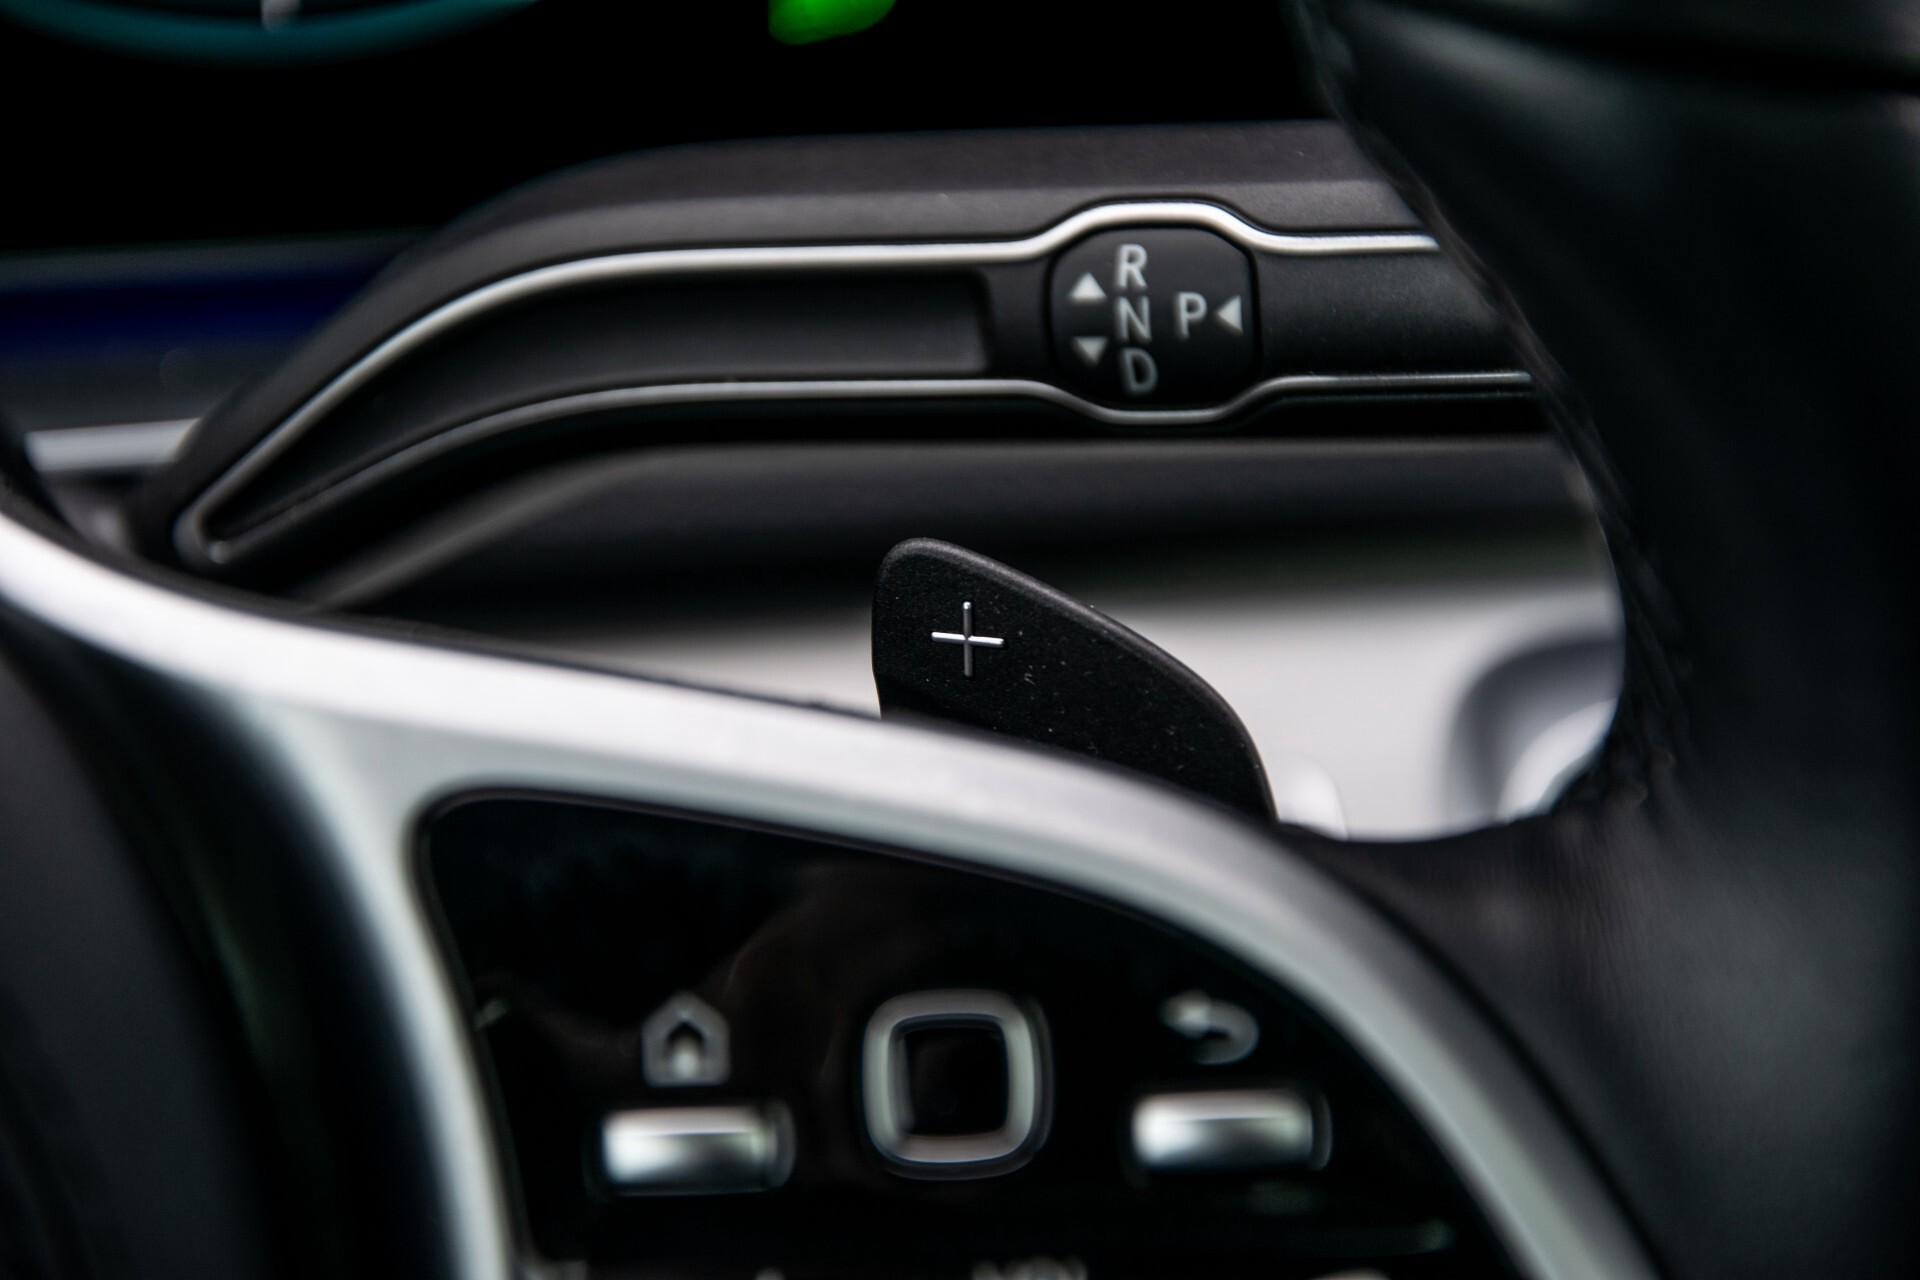 Mercedes-Benz GLE 450 4-M 7-Persoons AMG Massage/Rij-assist/Keyless/TV/360/Night/Trekhaak Aut9 Foto 15